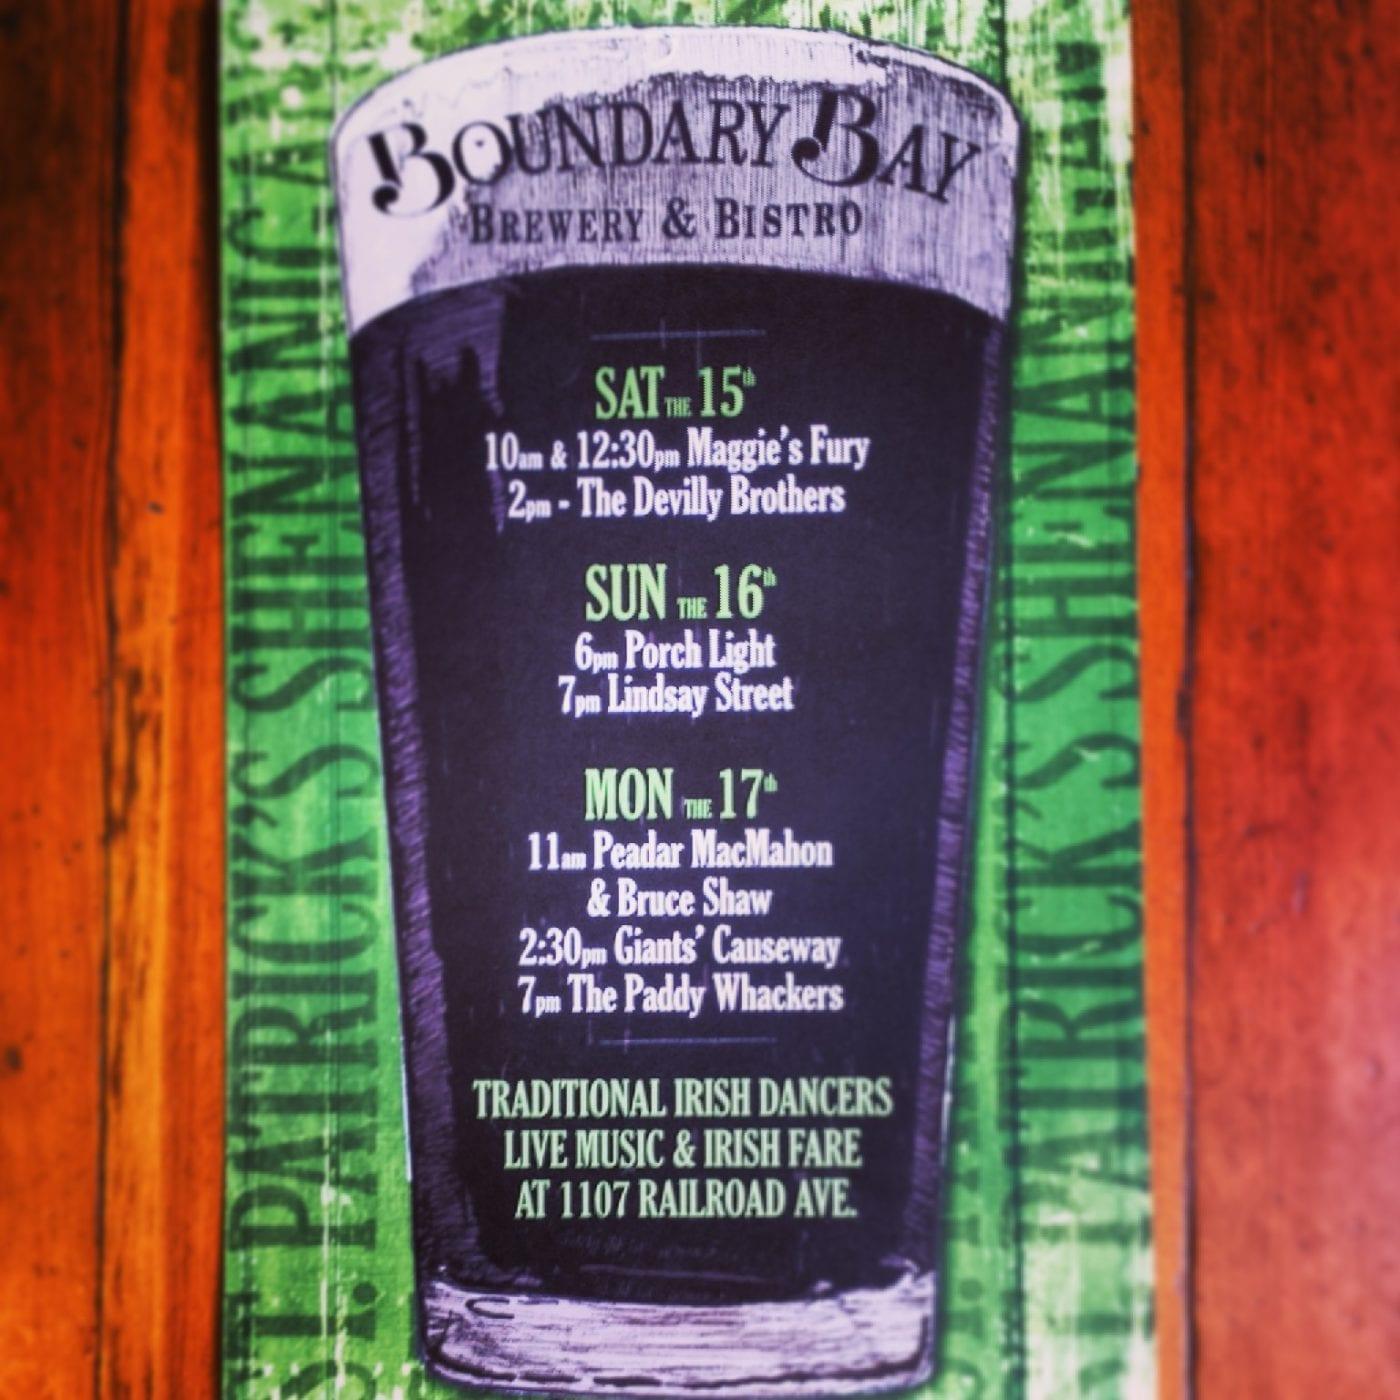 Boundary Bay Brewery, Irish Music, Bellingham, St. Patrick's Day, Craft Beer, Whatcom County, Parade